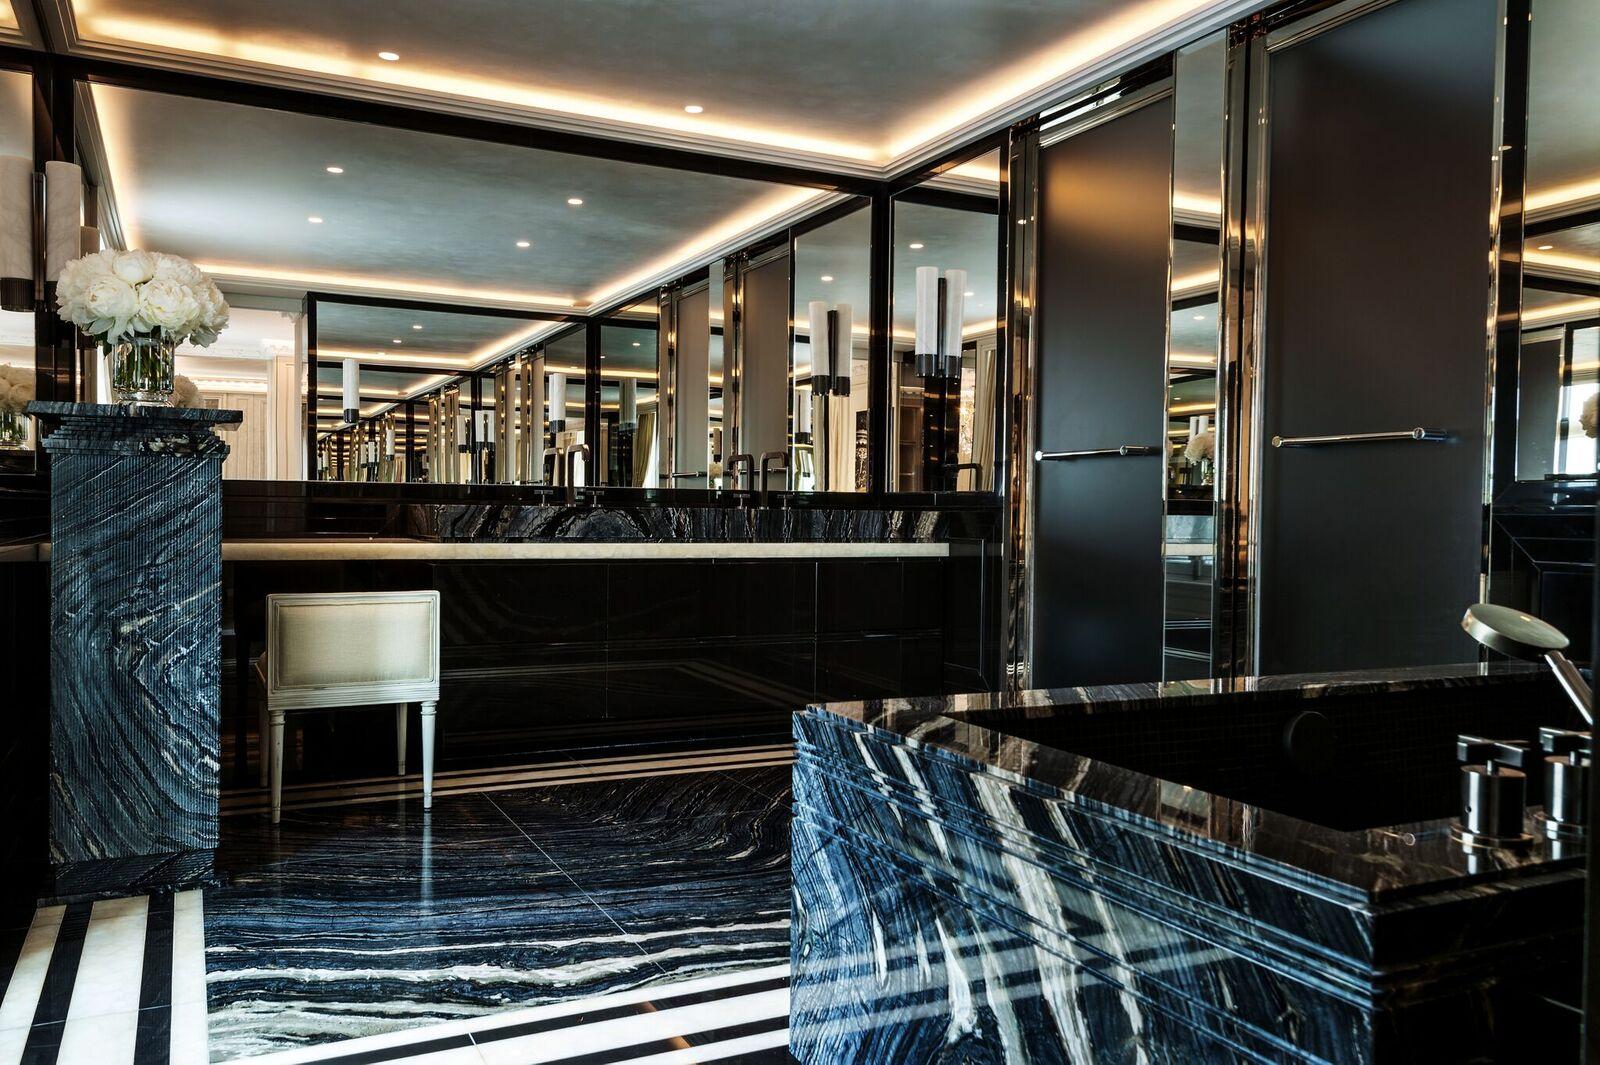 Hotel Crillon, Andy Haslam, natural stone bathrooms, luxury bathrooms, bathroom design